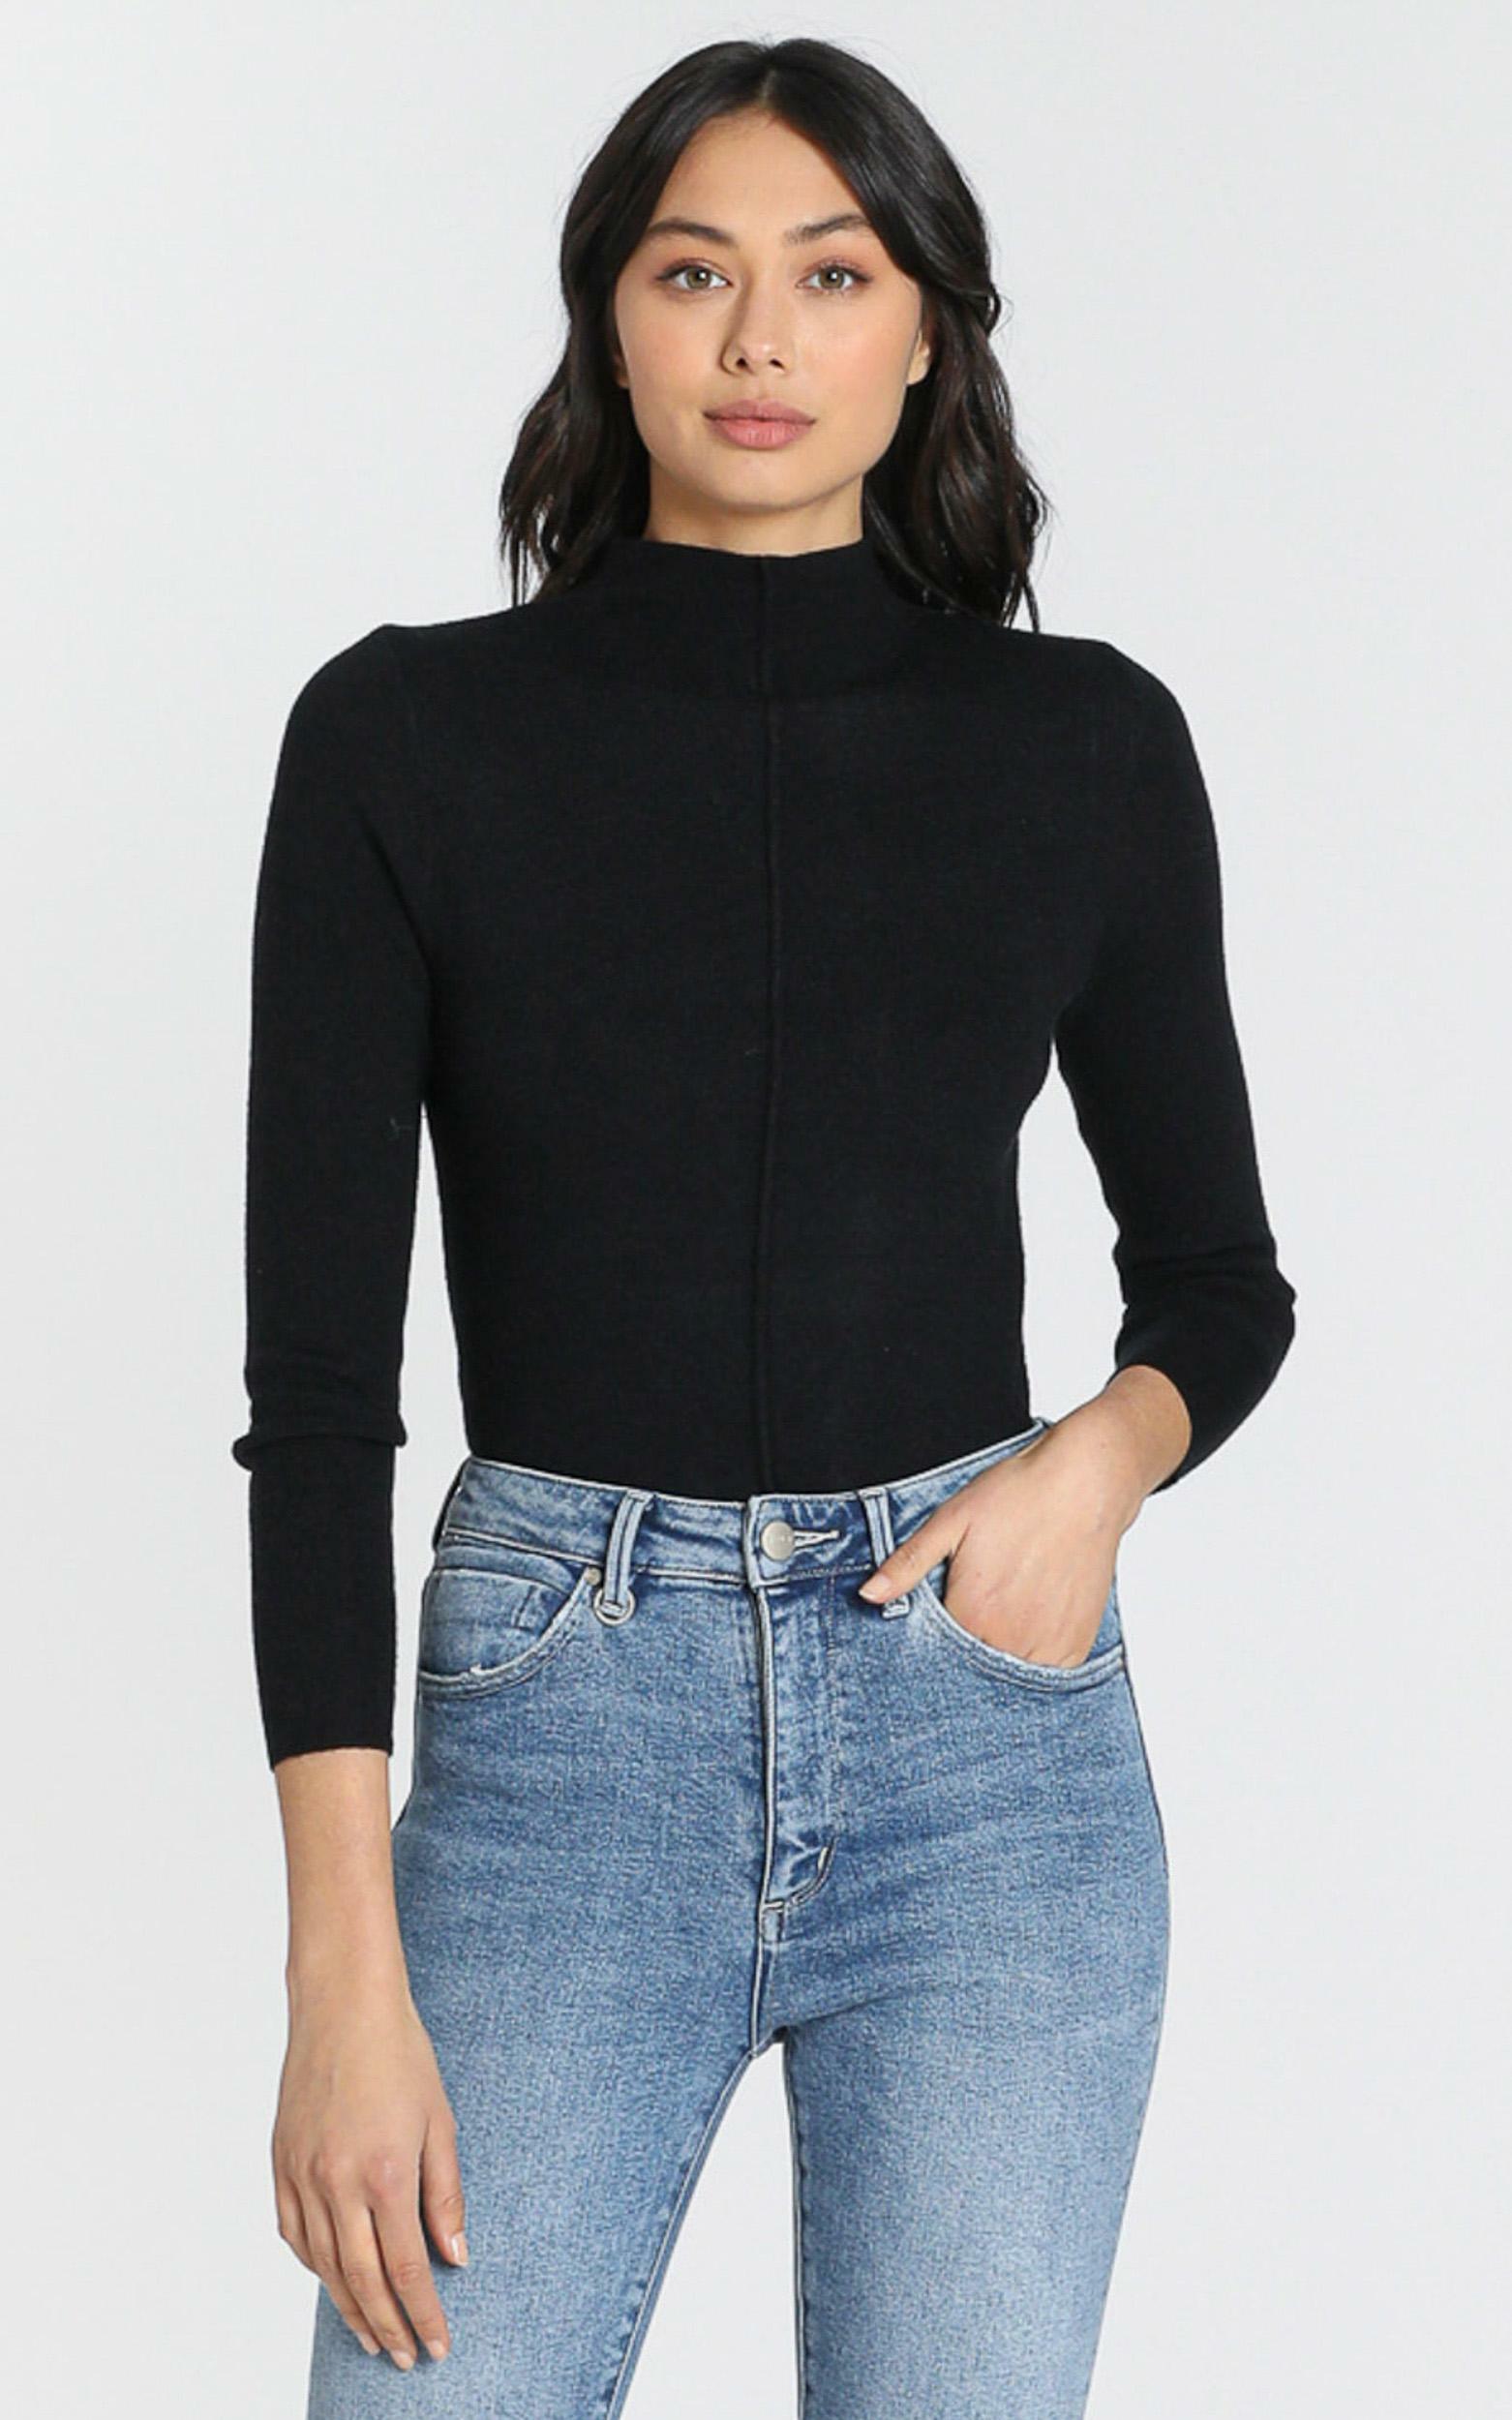 Camden Knit Top in black - S/M, Black, hi-res image number null